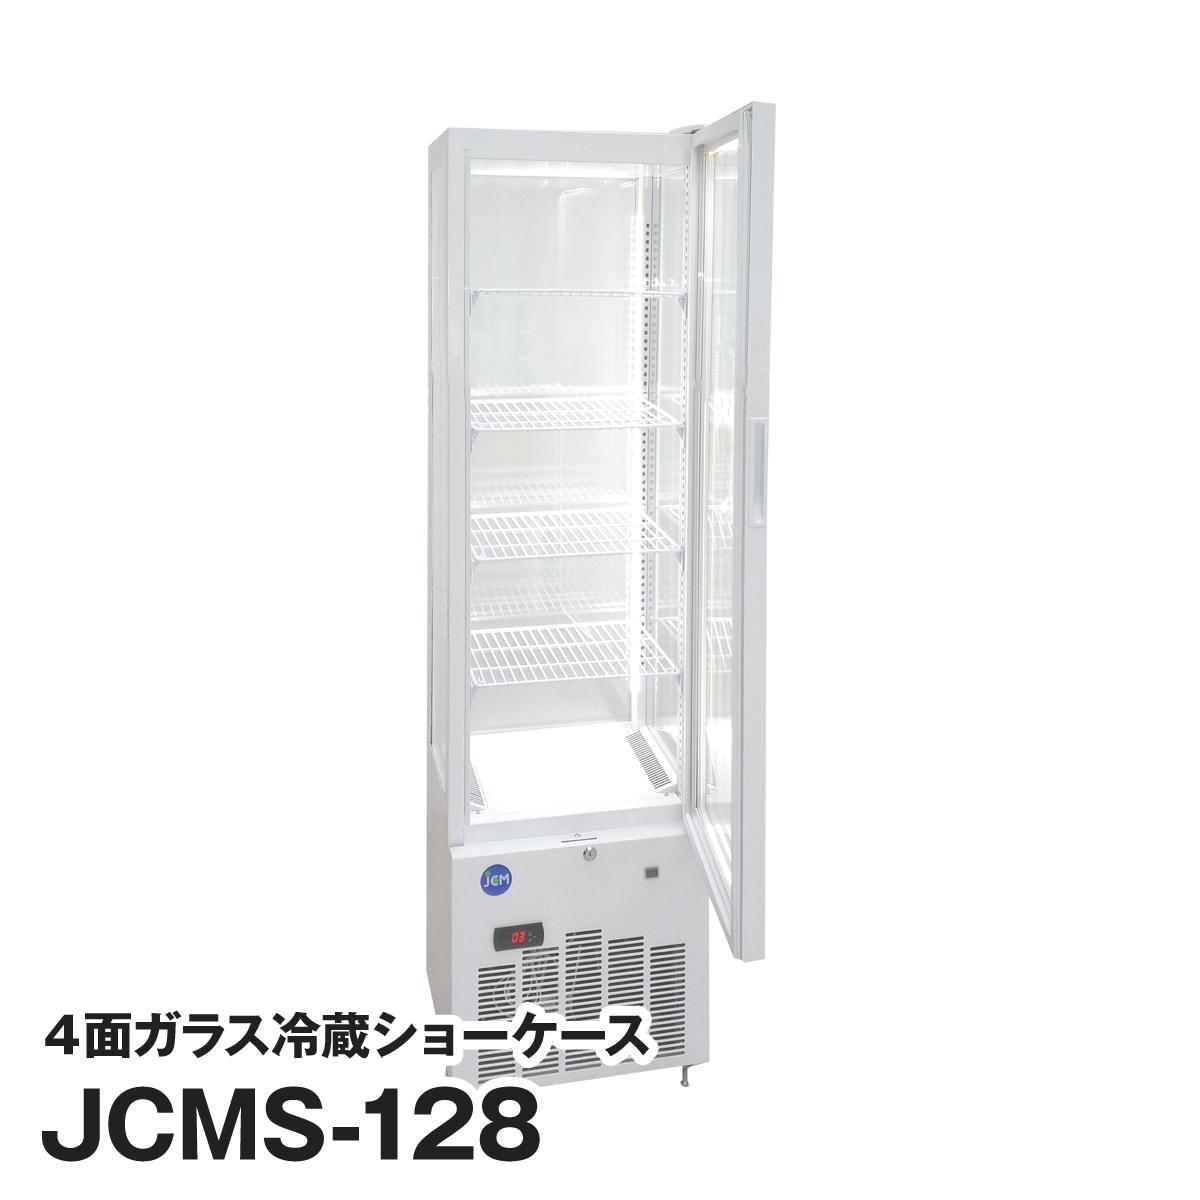 JCM社製 業務用 保冷庫 冷蔵庫 128L 4面 ガラス 冷蔵 ショーケース JCMS-128 新品